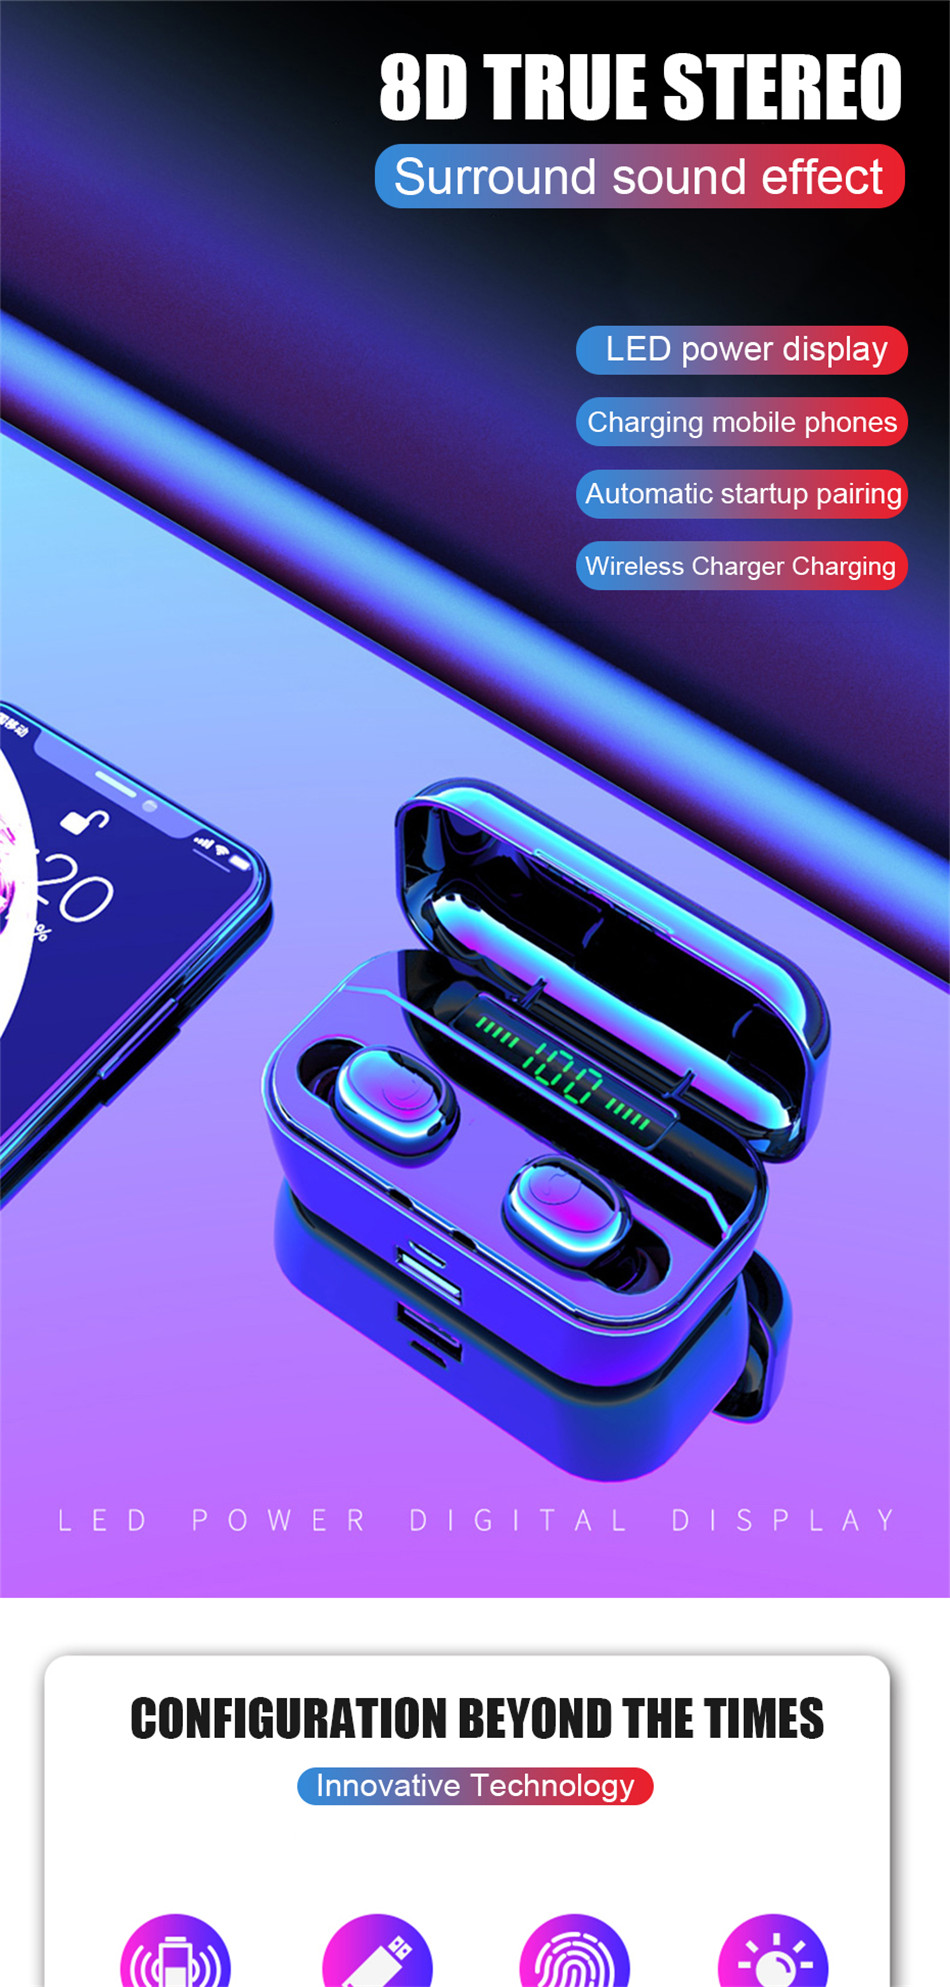 HOT SALE] VOULAO Bluetooth Earphone G6s TWS Wireless Headphone With